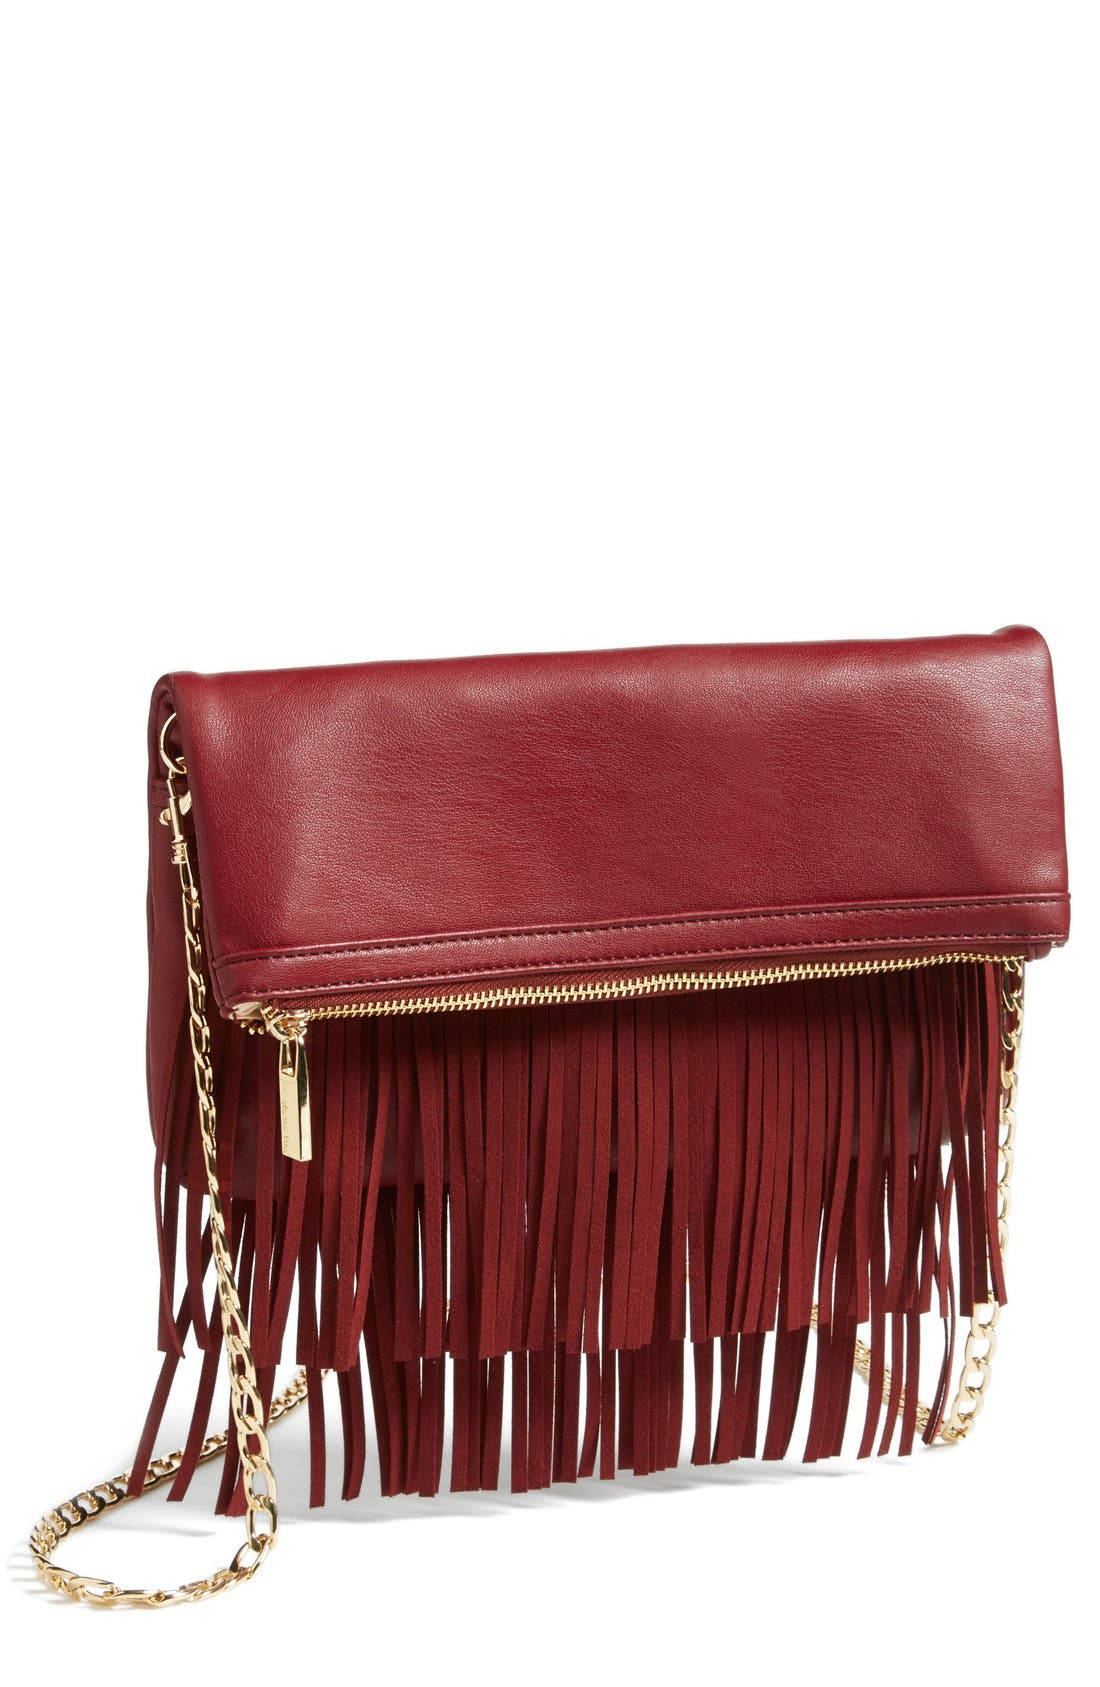 Alternate Image 1 Selected - Deux Lux 'Joplin' Convertible Foldover Crossbody Bag